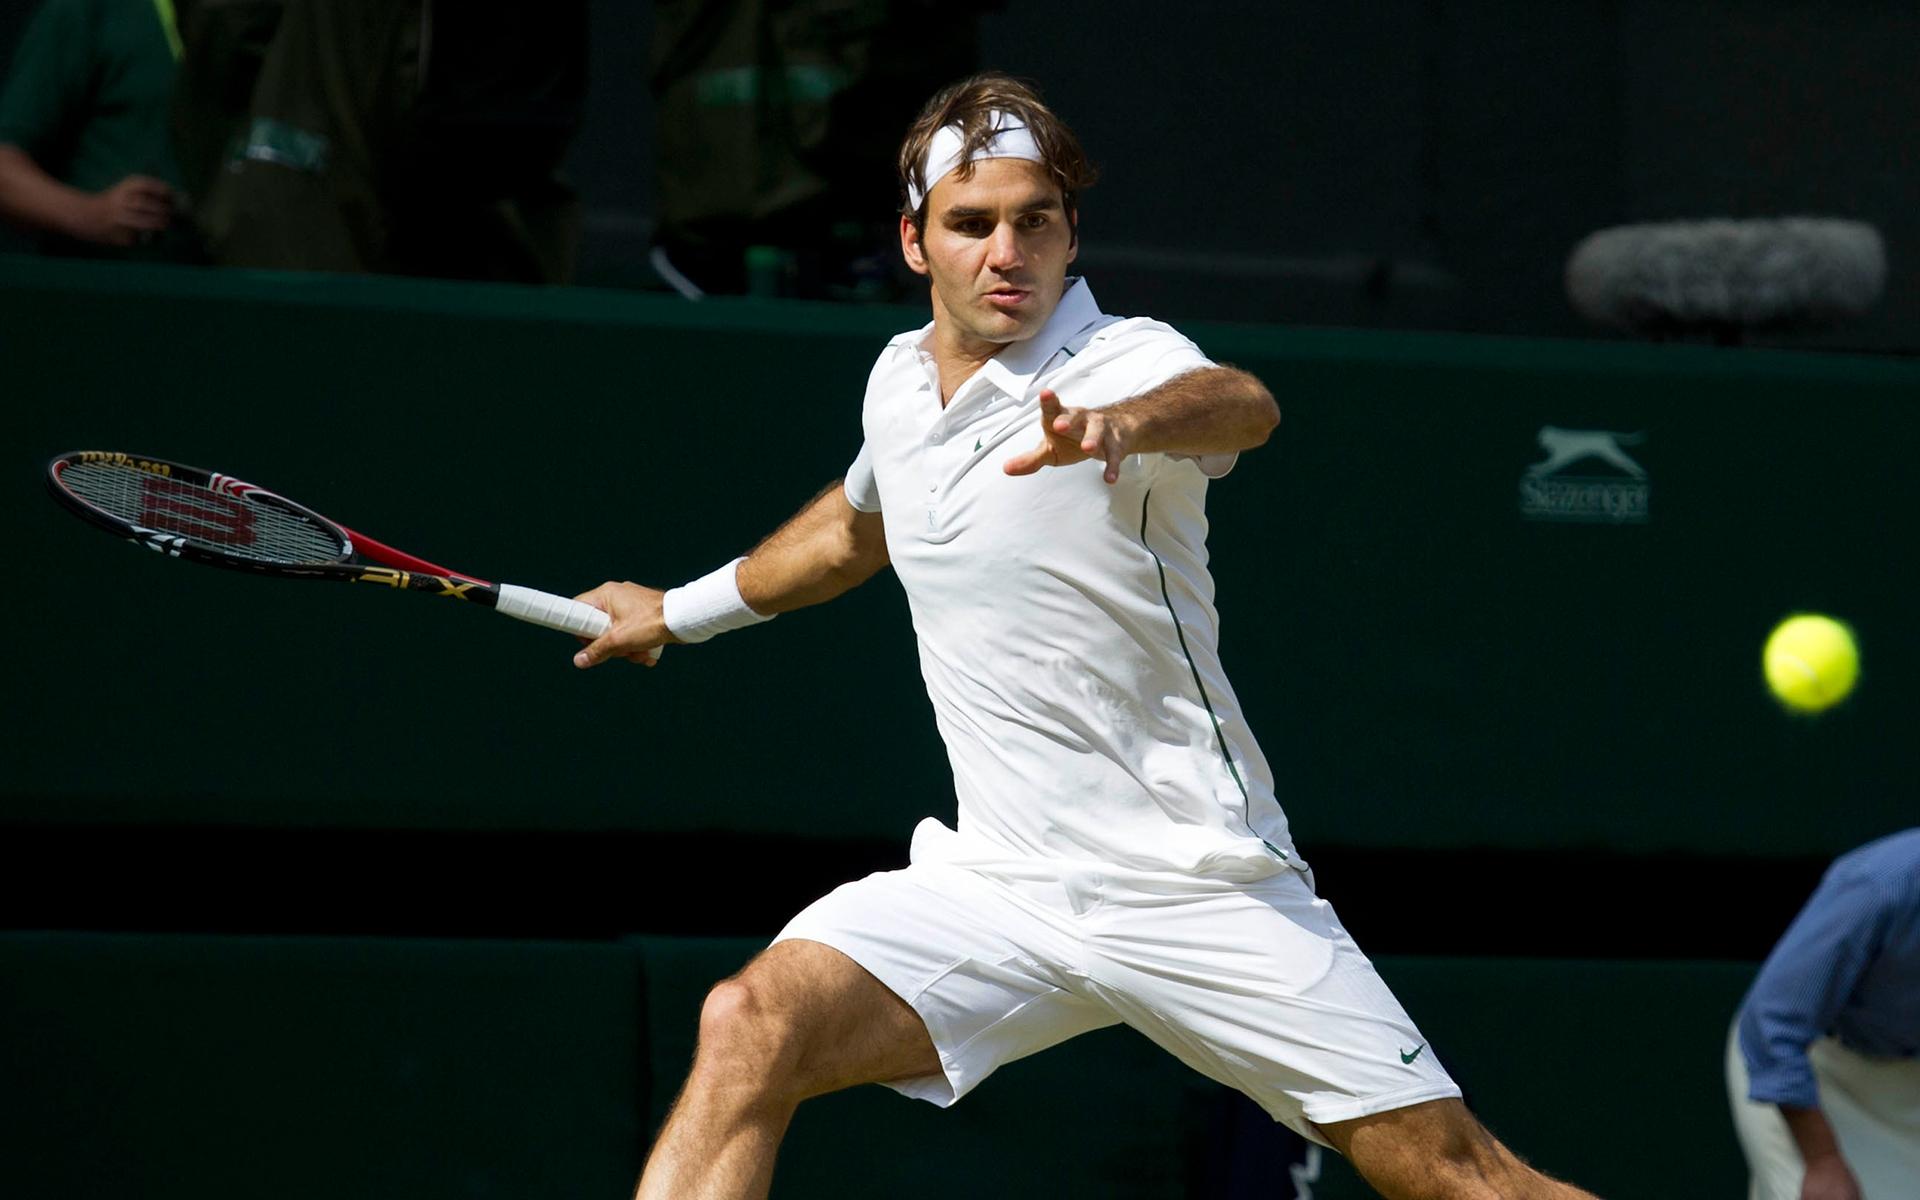 Roger Federer Tennis Wallpaper 64974 1920x1200px